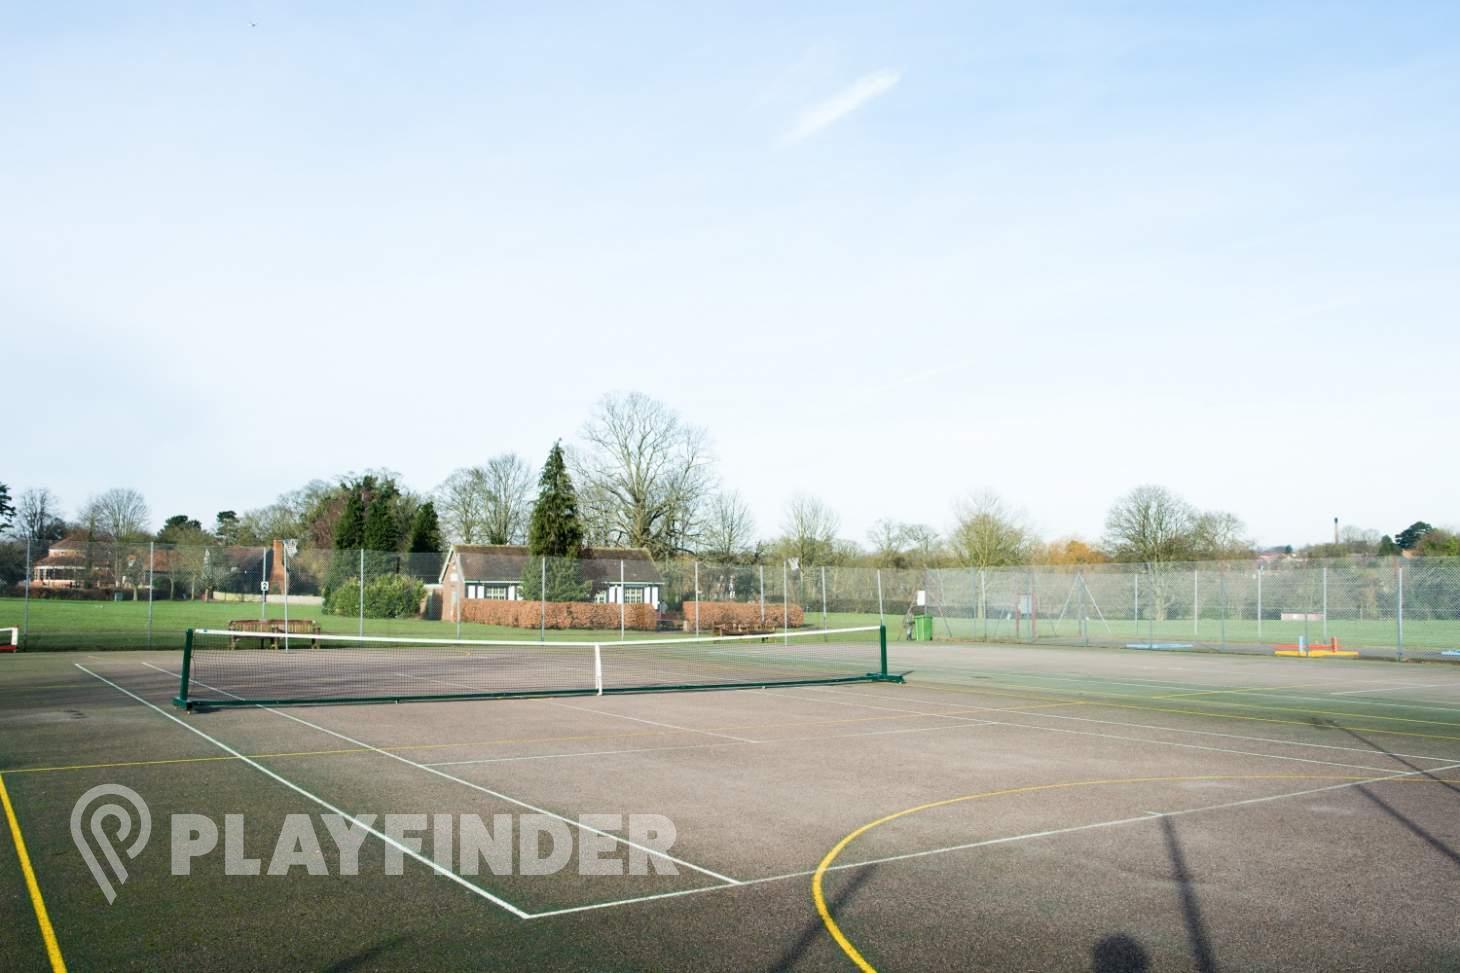 Abbey View Golf Course Outdoor | Hard (macadam) tennis court